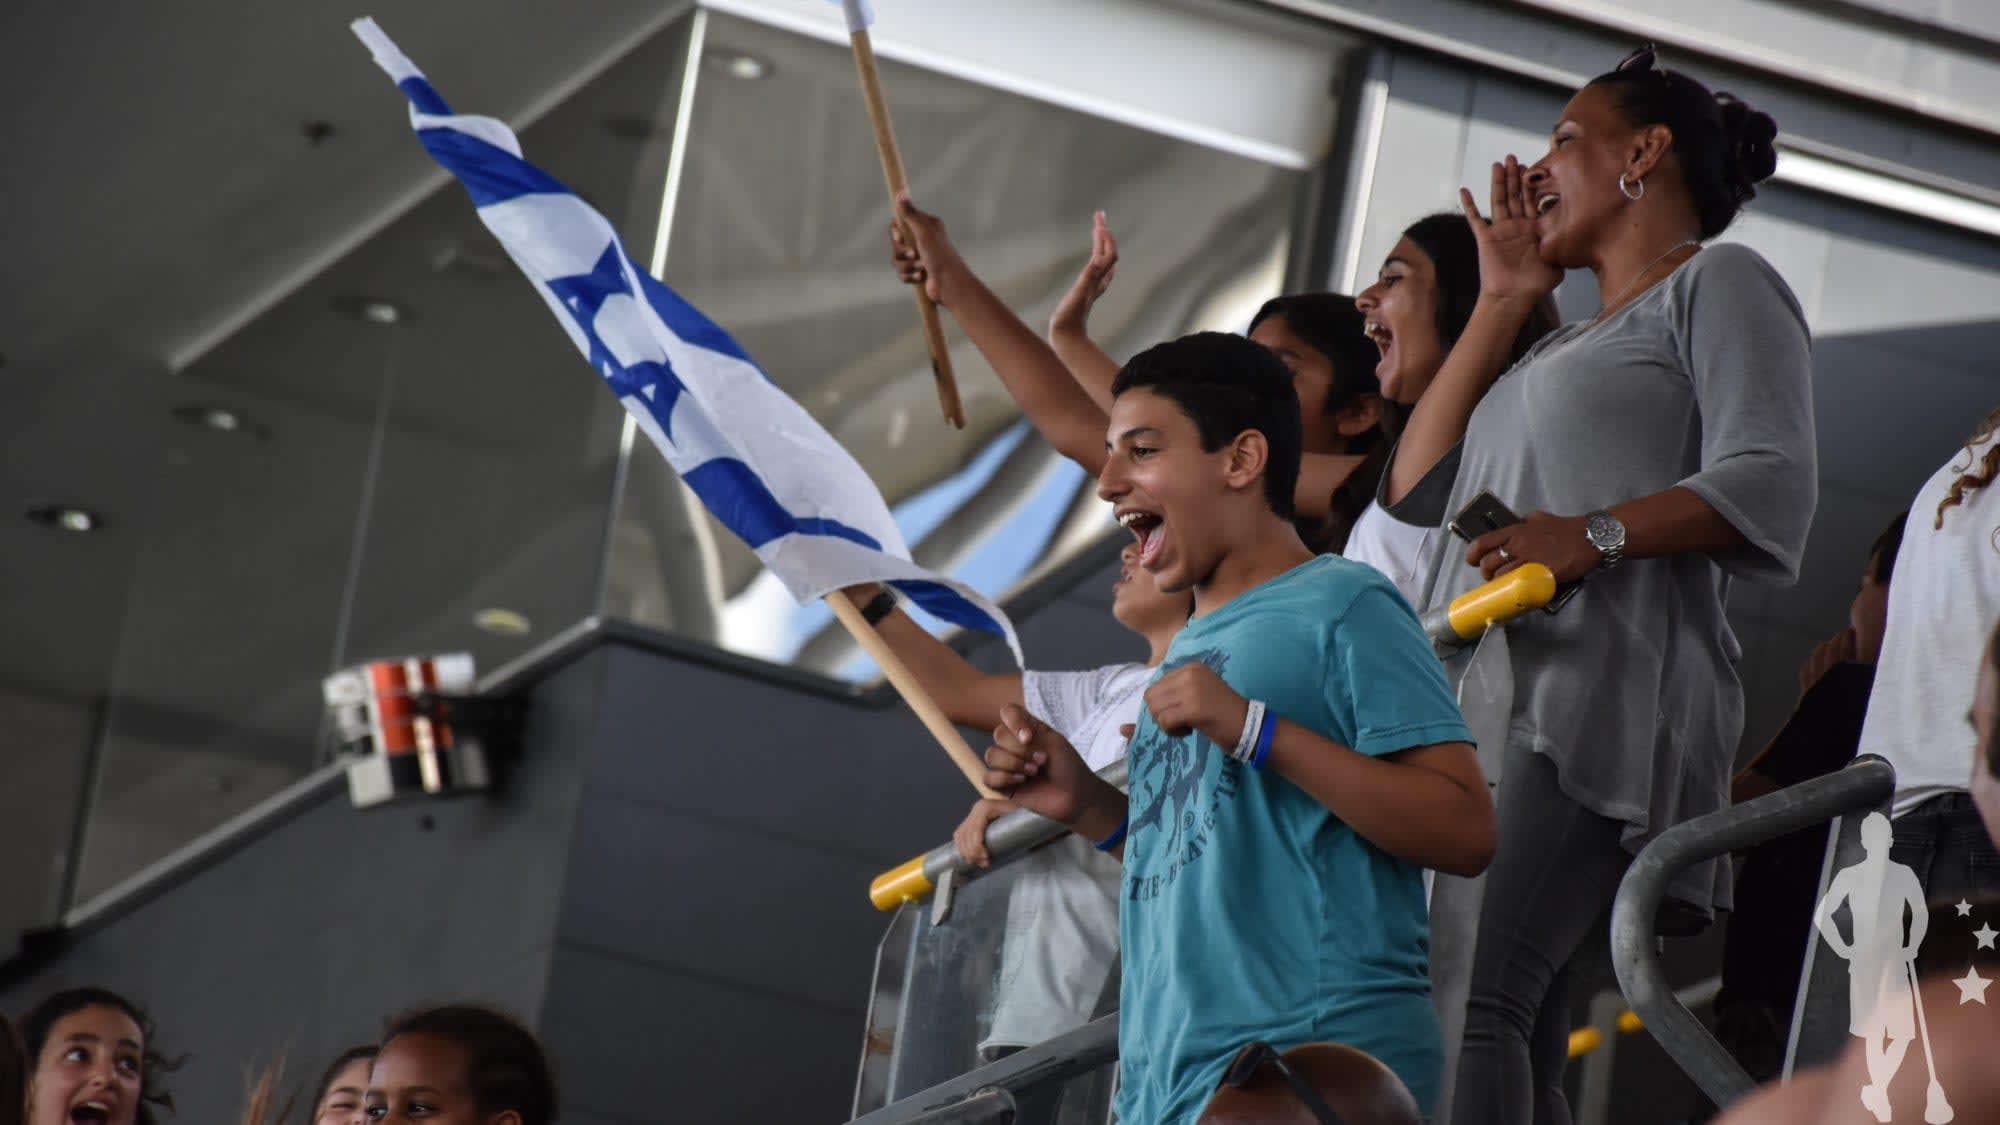 Israel Jamaica 2018 FIL World Lacrosse Championships